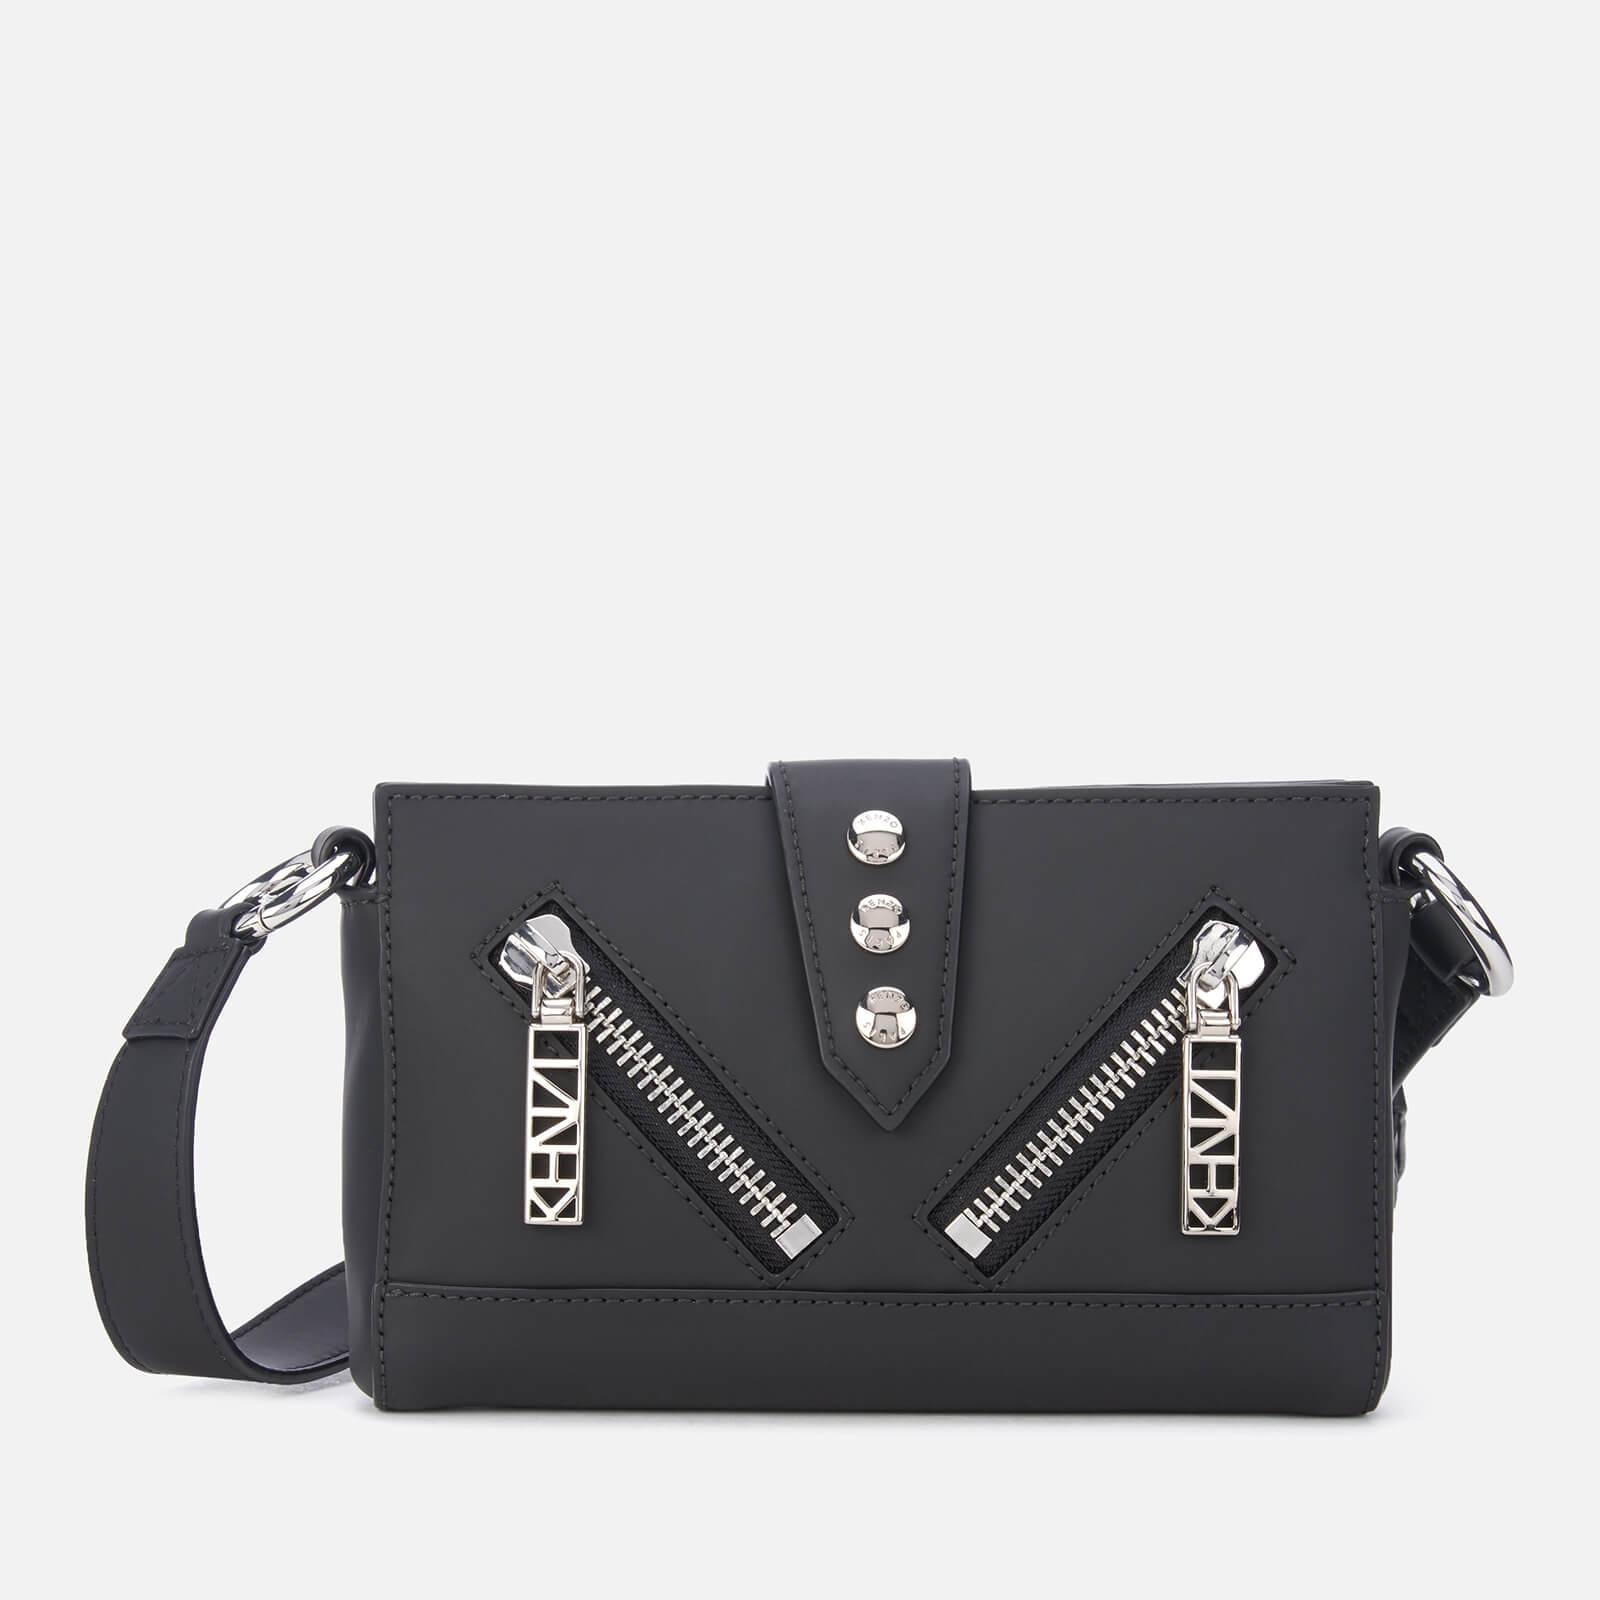 bd3185088e2 KENZO Women's Kalifornia Zip Bumbag - Black - Free UK Delivery over £50